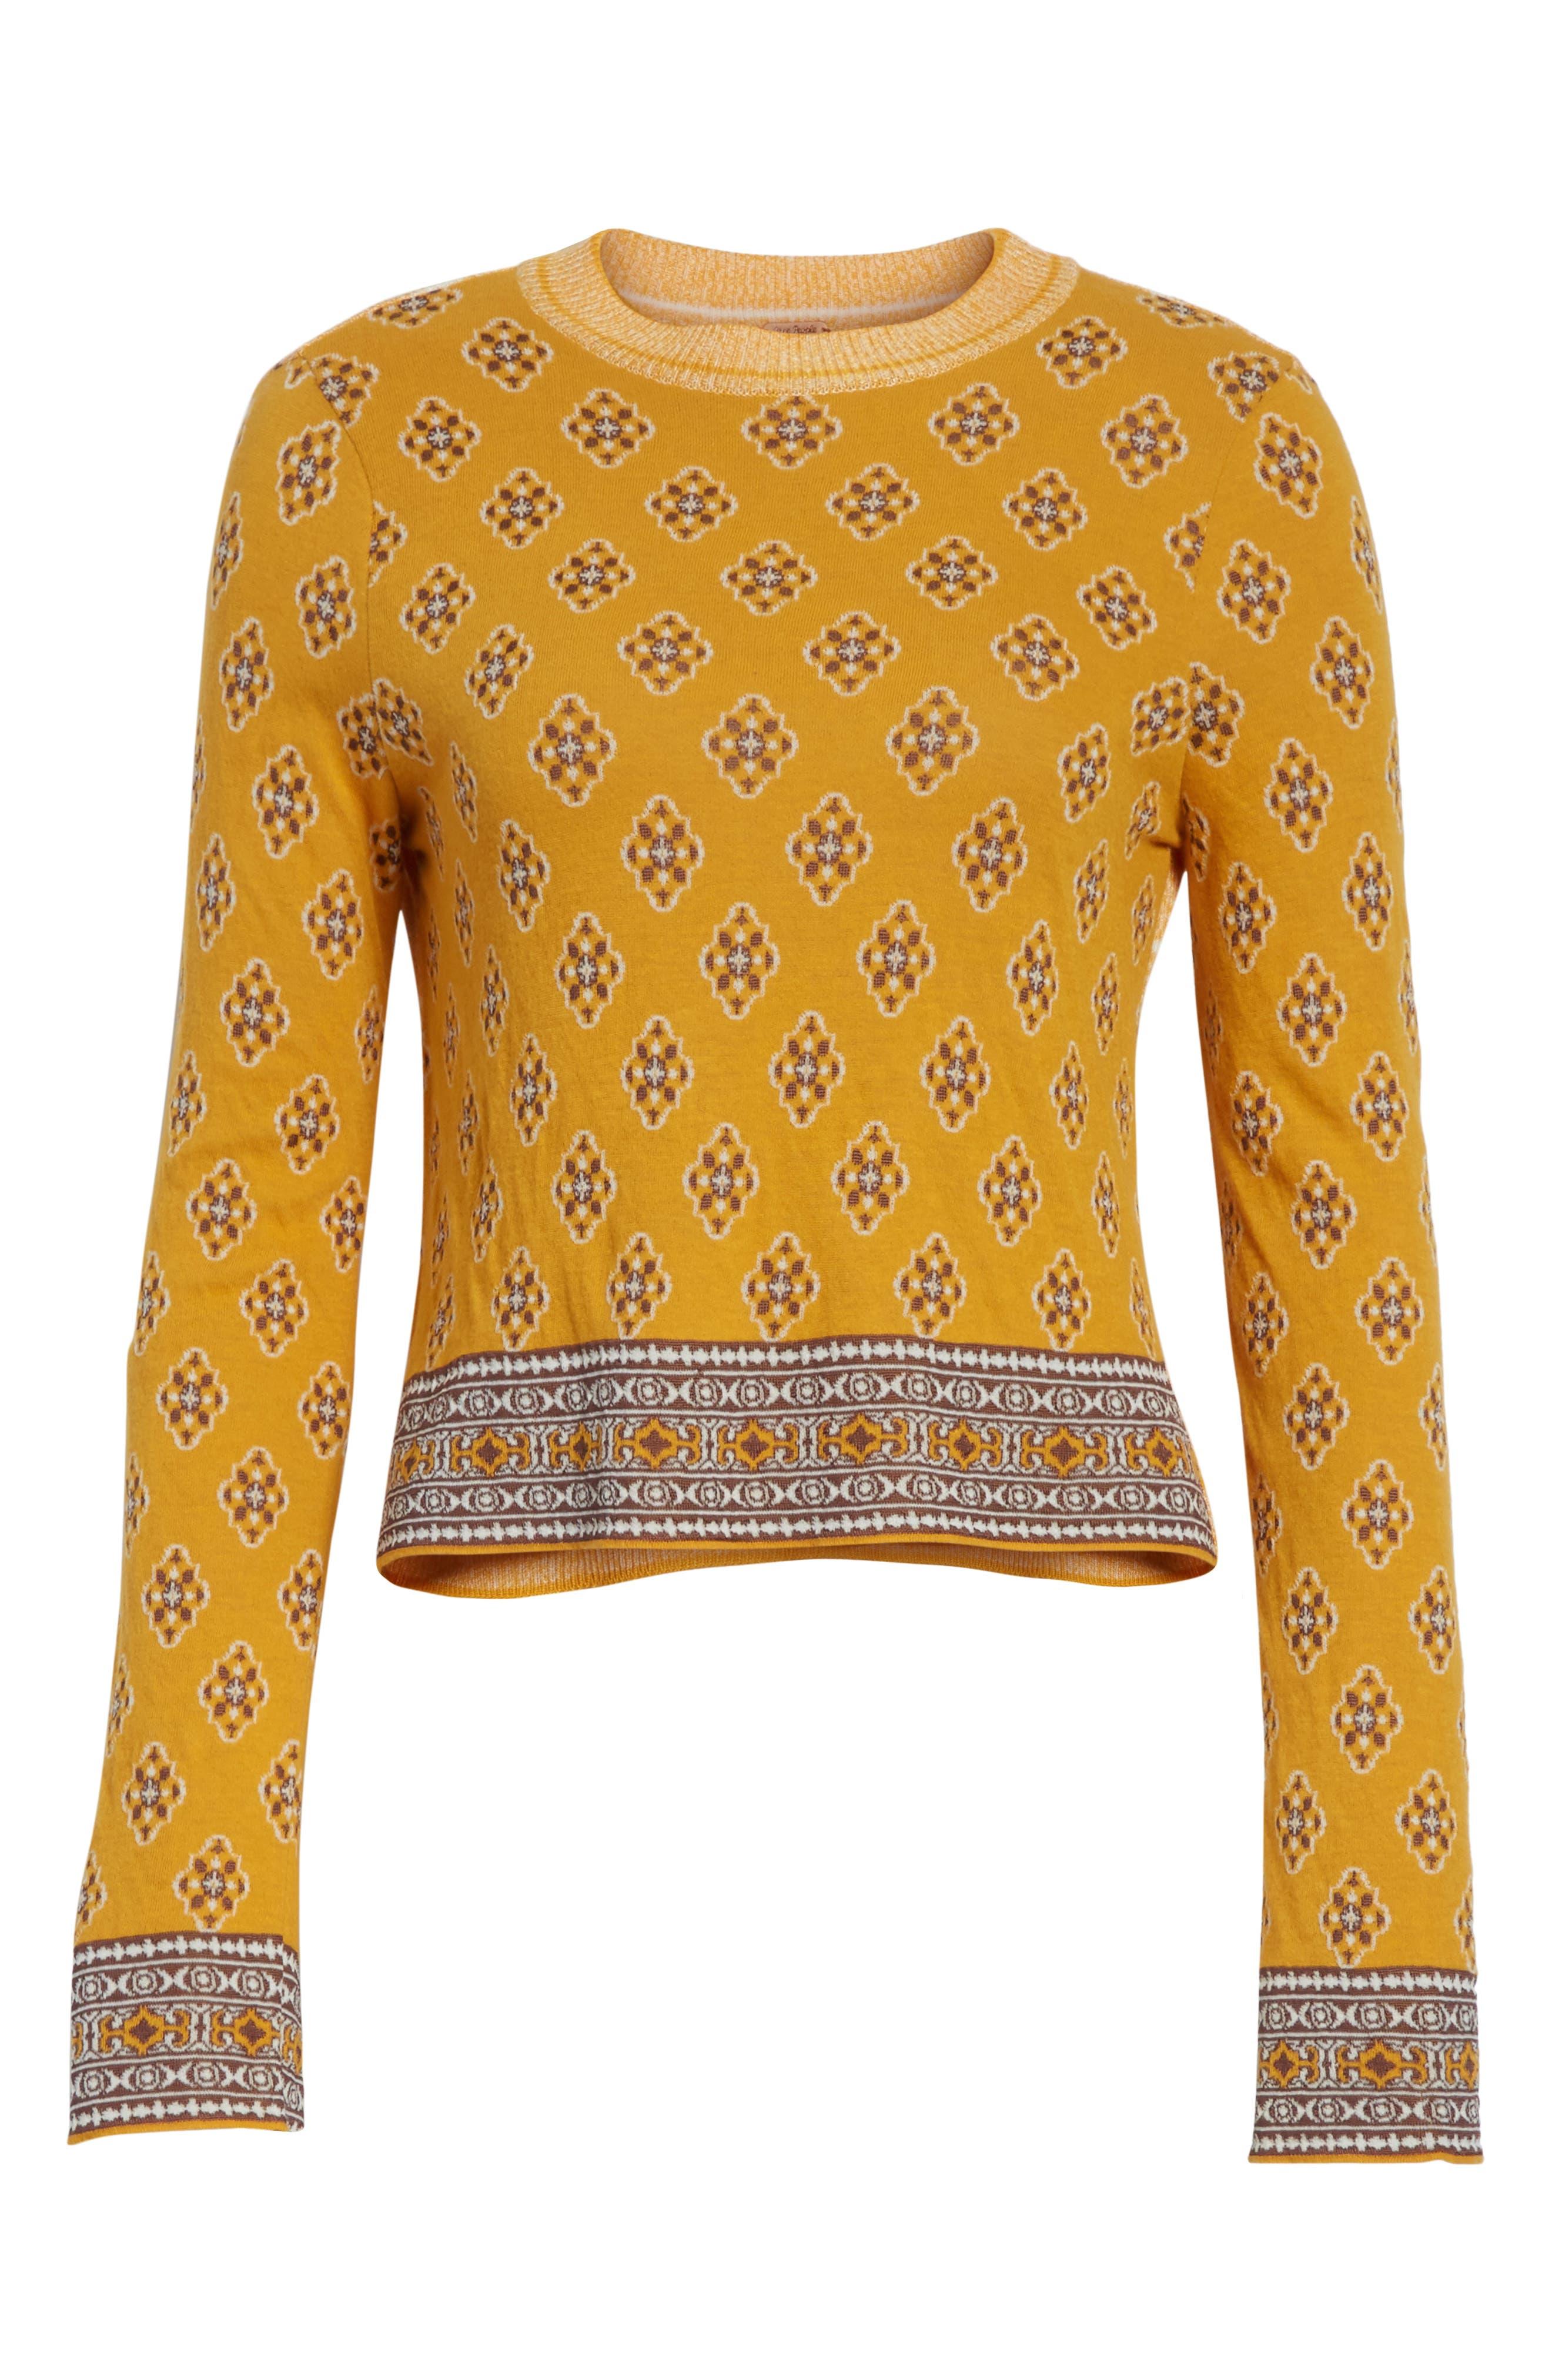 New Age Crewneck Sweater,                             Alternate thumbnail 17, color,